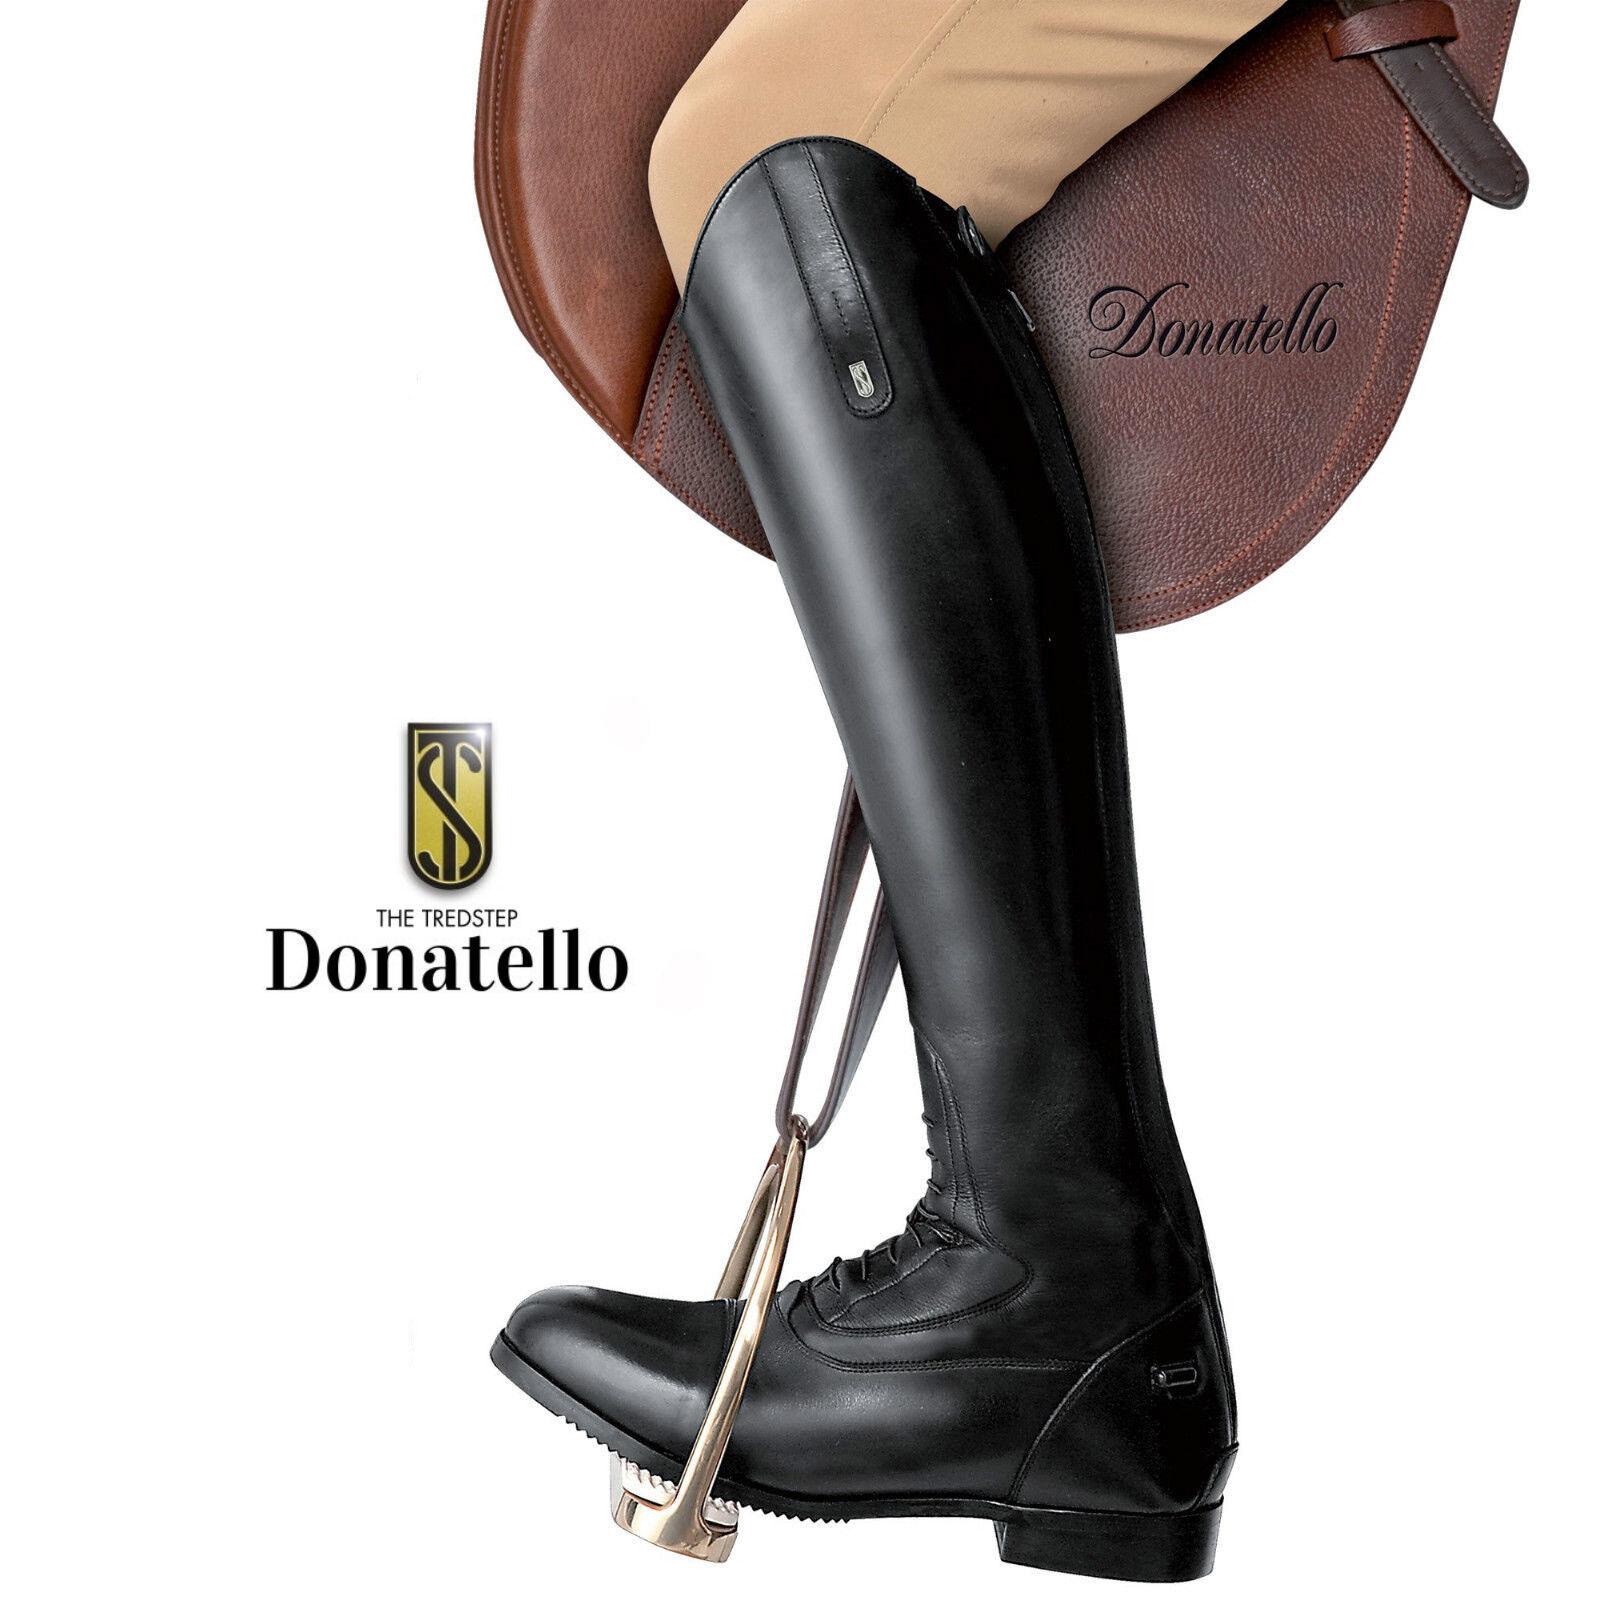 Trojostep Donatello campo Bota Talla 6.5 EU40 Altura Pantorrilla Mediano Regular  .